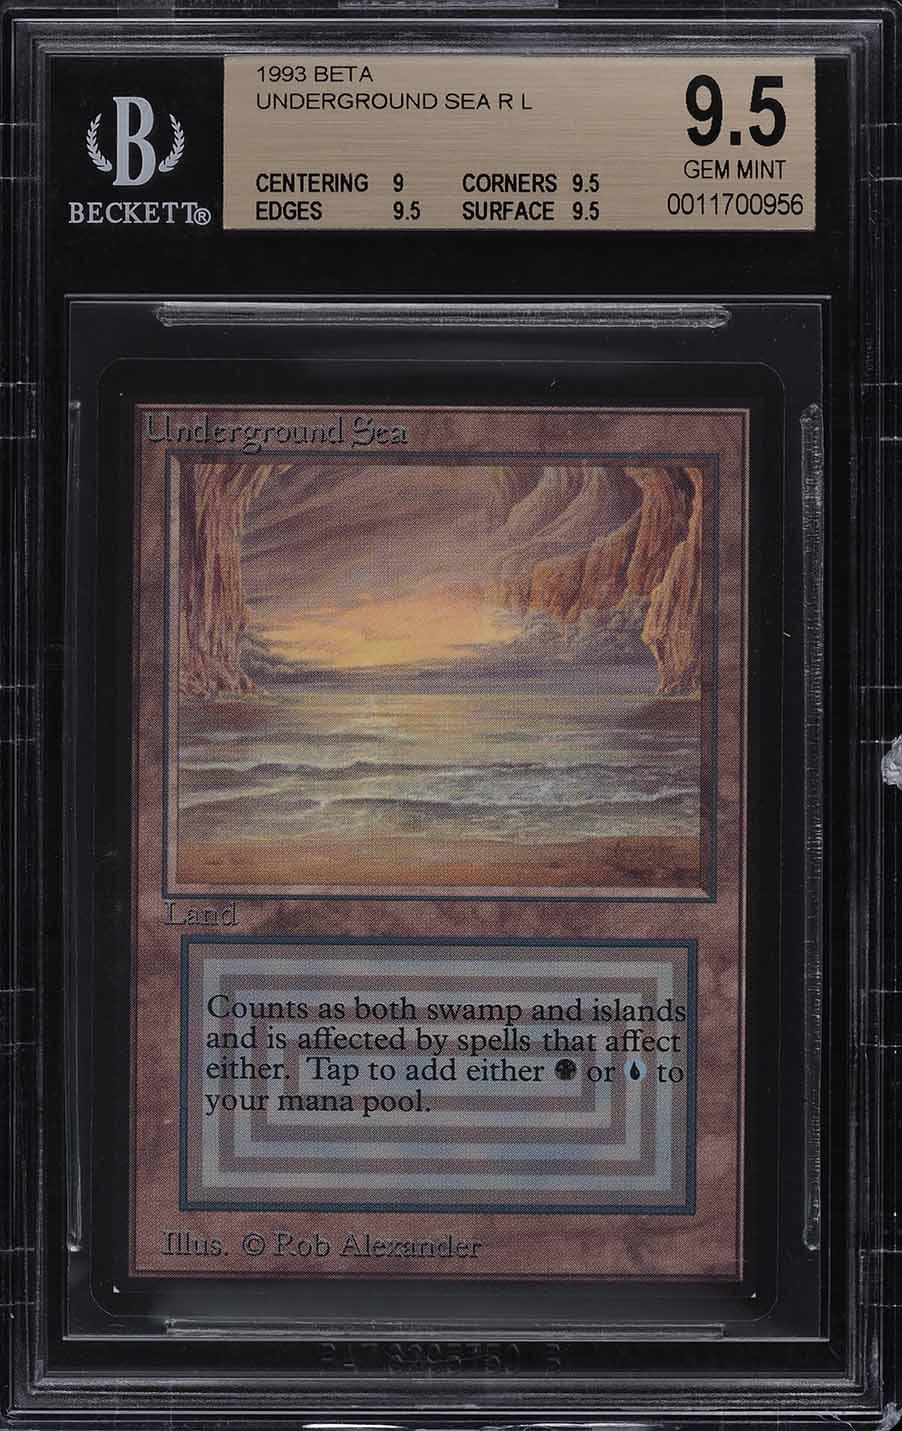 1993 Magic The Gathering MTG Beta Dual Land Underground Sea R L BGS 9.5 (PWCC) - Image 1